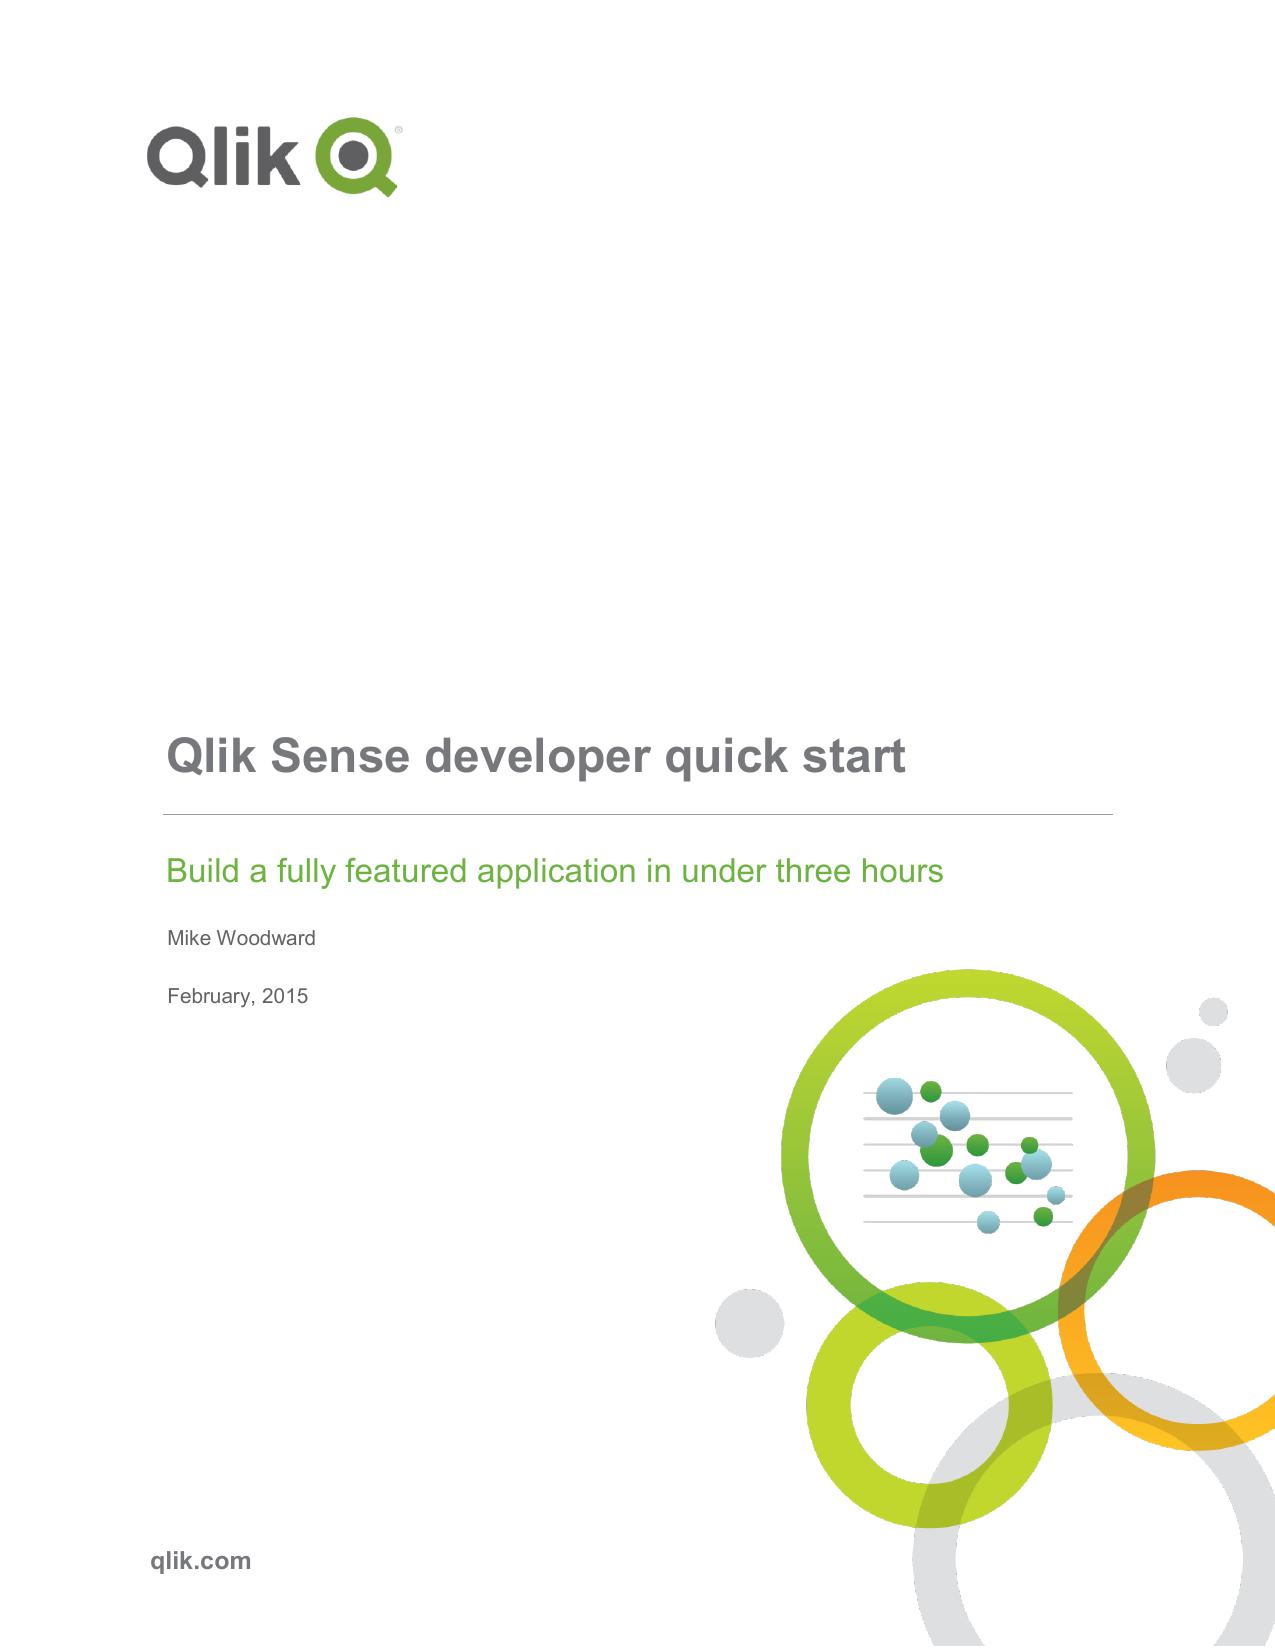 Qlik Sense developer quick start